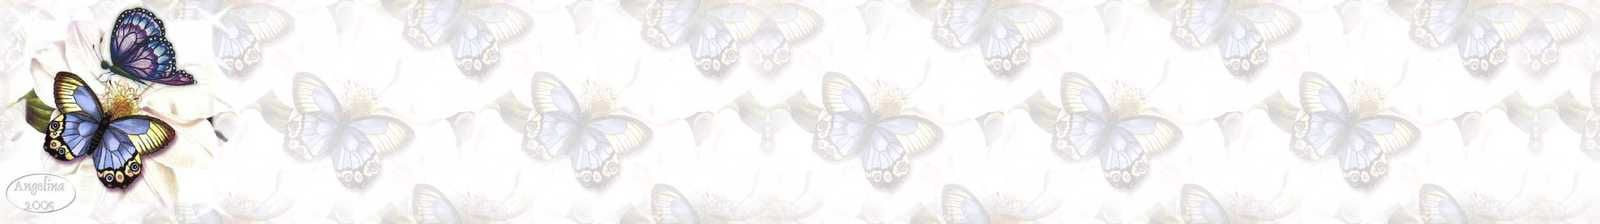 Papillons Incredimail &amp&#x3B; Papier A4 h l &amp&#x3B; outlook &amp&#x3B; enveloppe &amp&#x3B; 2 cartes A5 &amp&#x3B; signets 3 langues    papillons_bleu